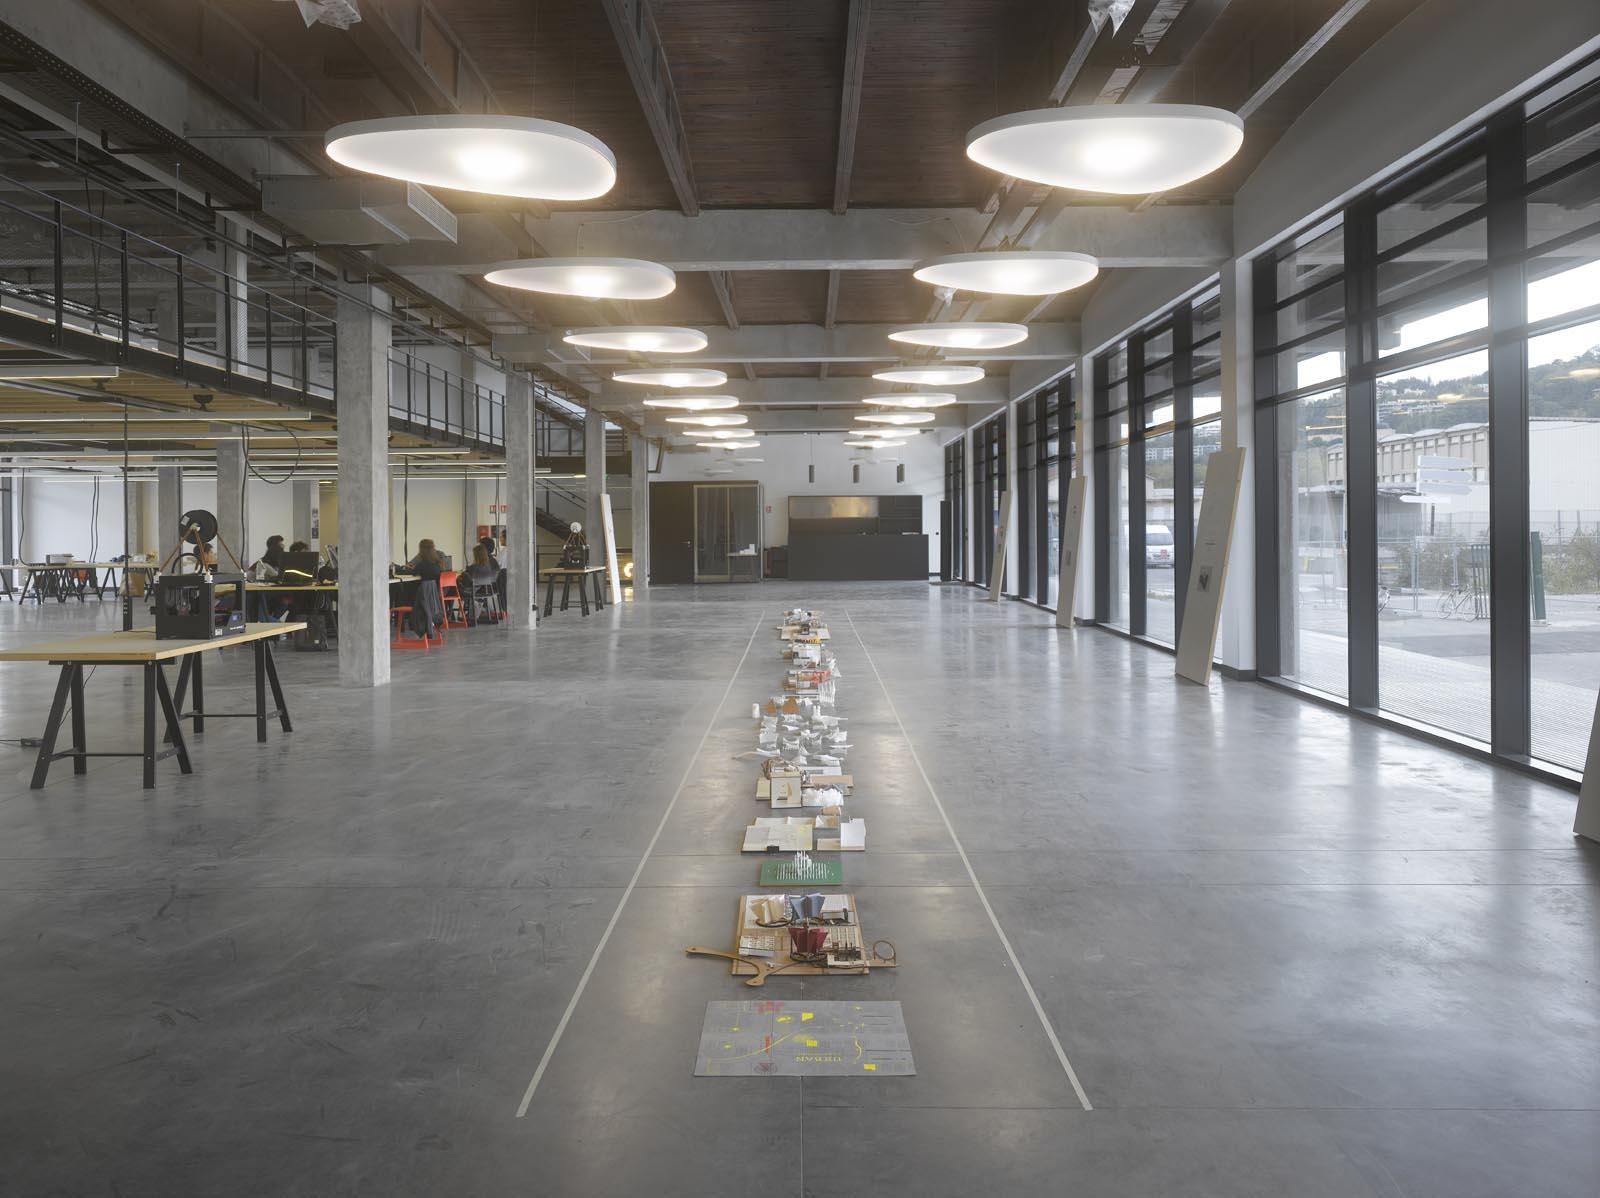 Odile decq s confluence school of architecture in lyon for Architecture lyon